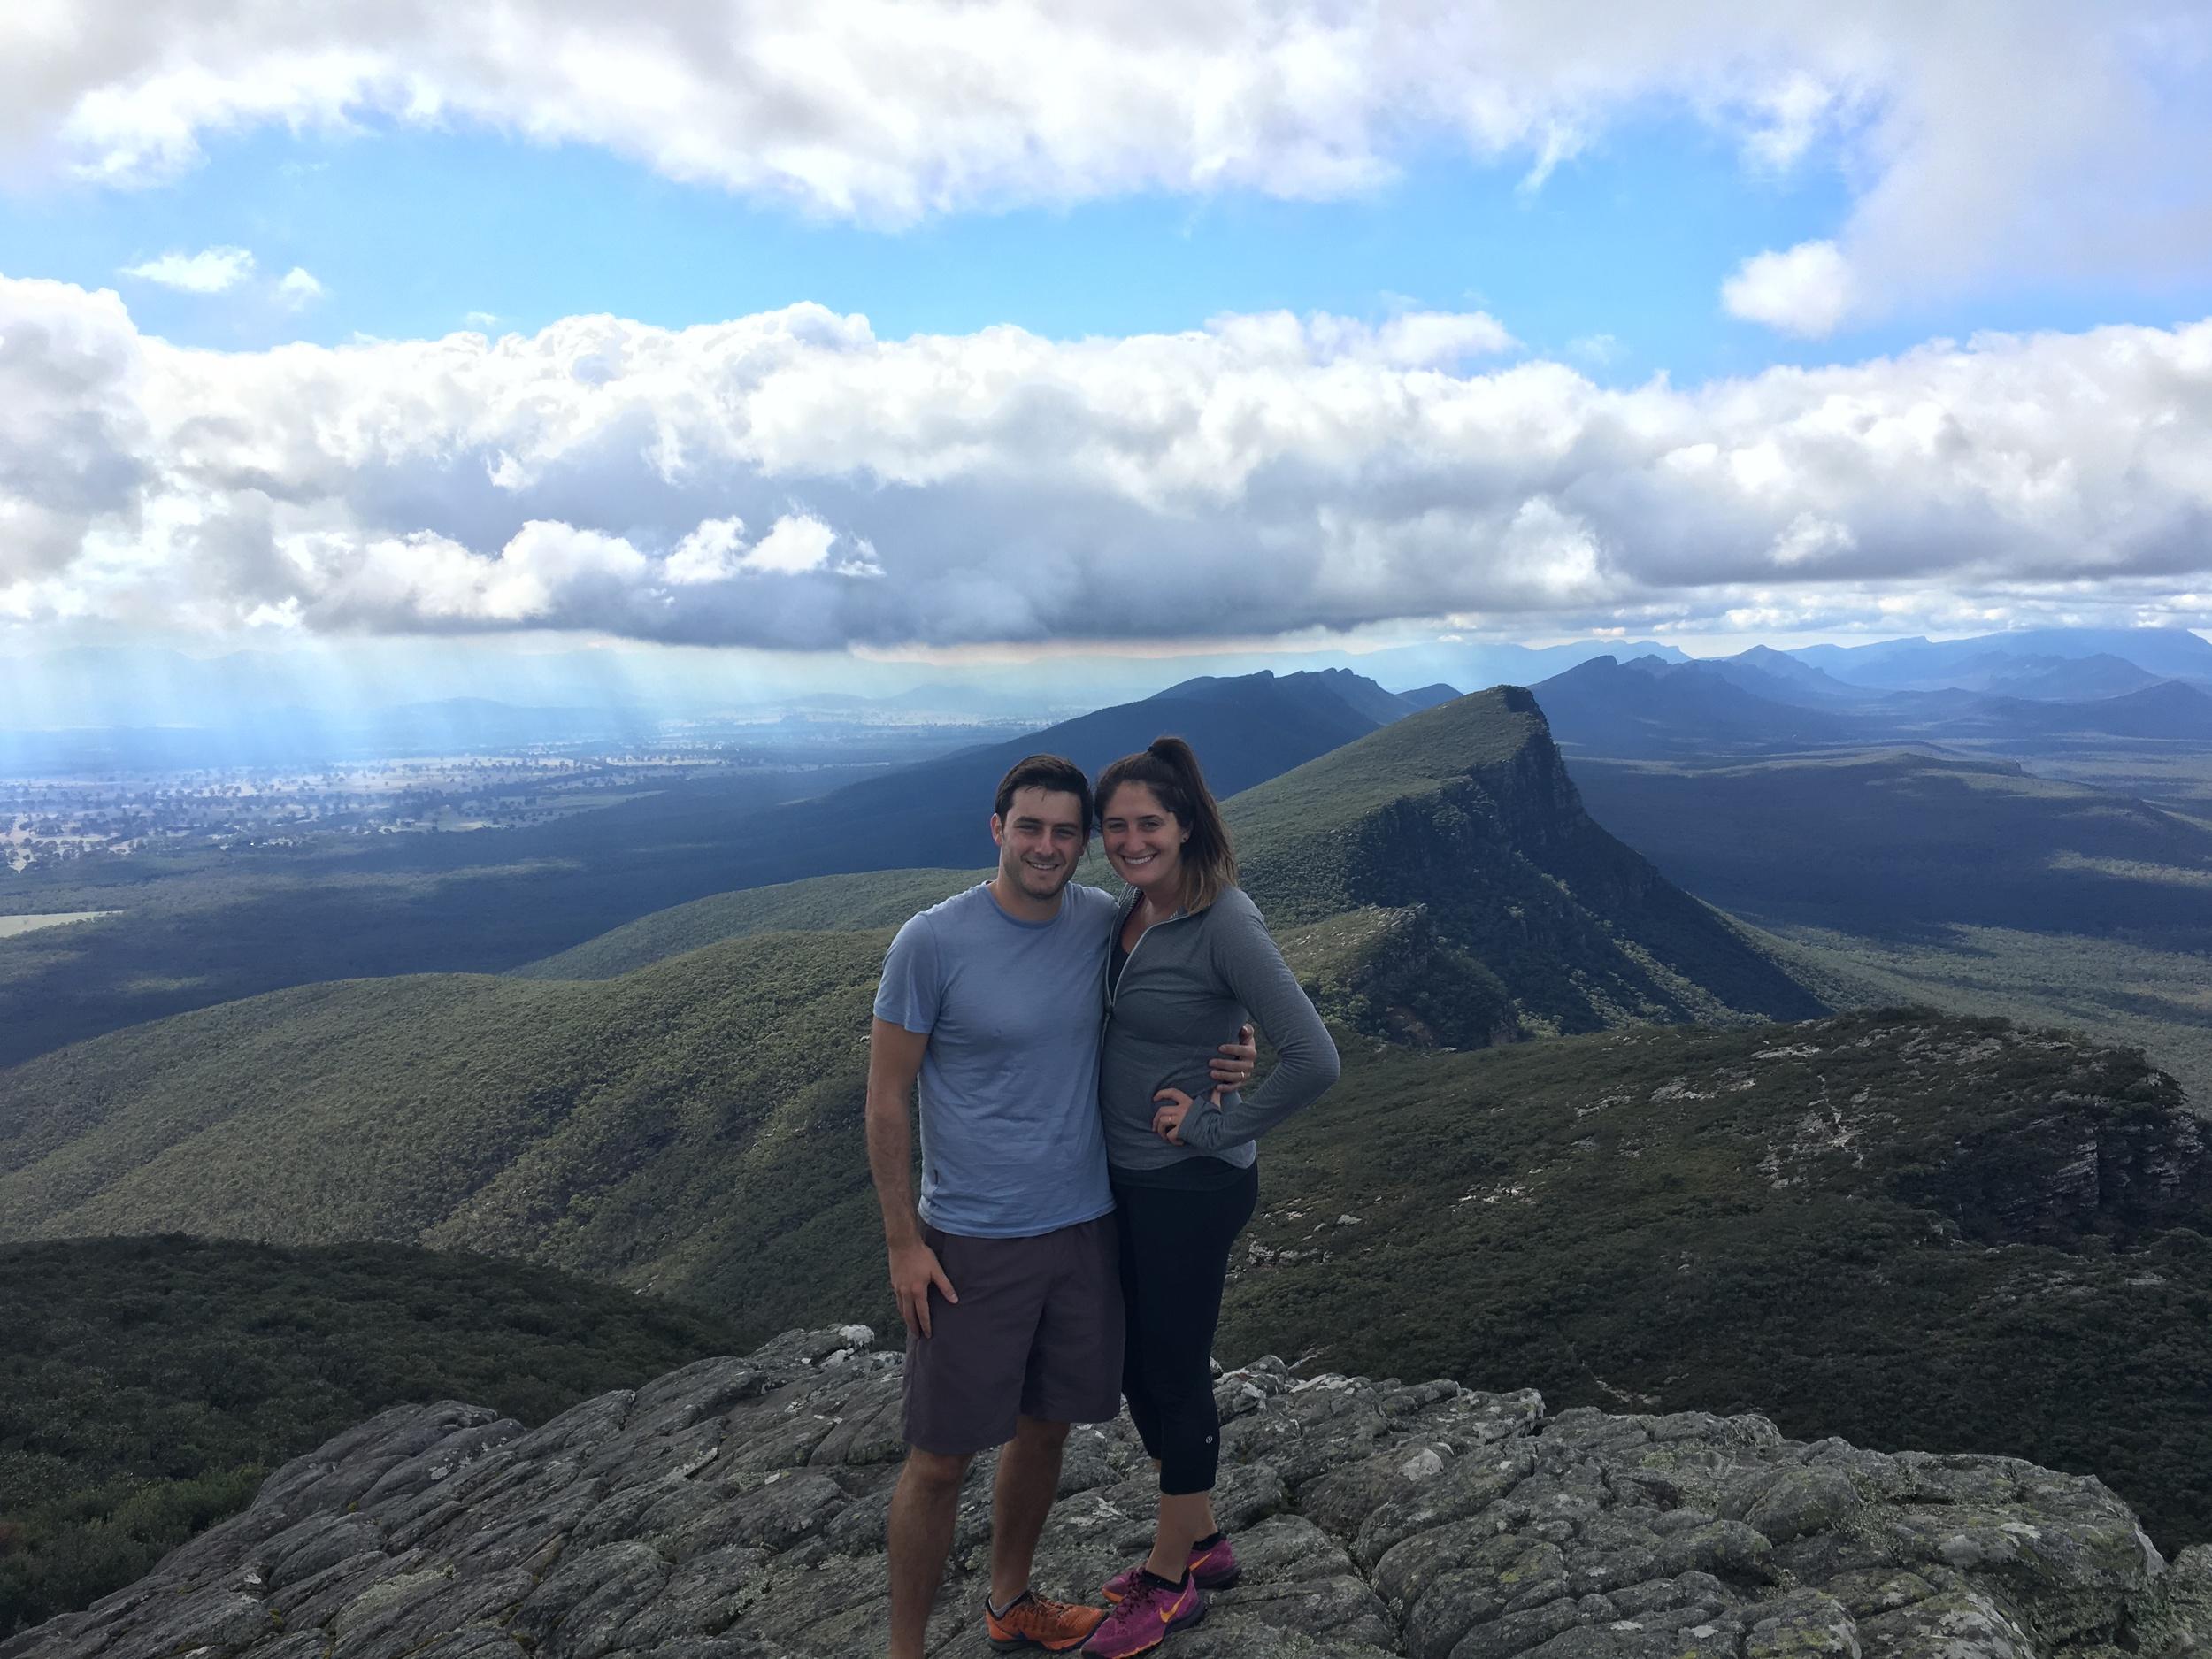 On Mount Abrupt